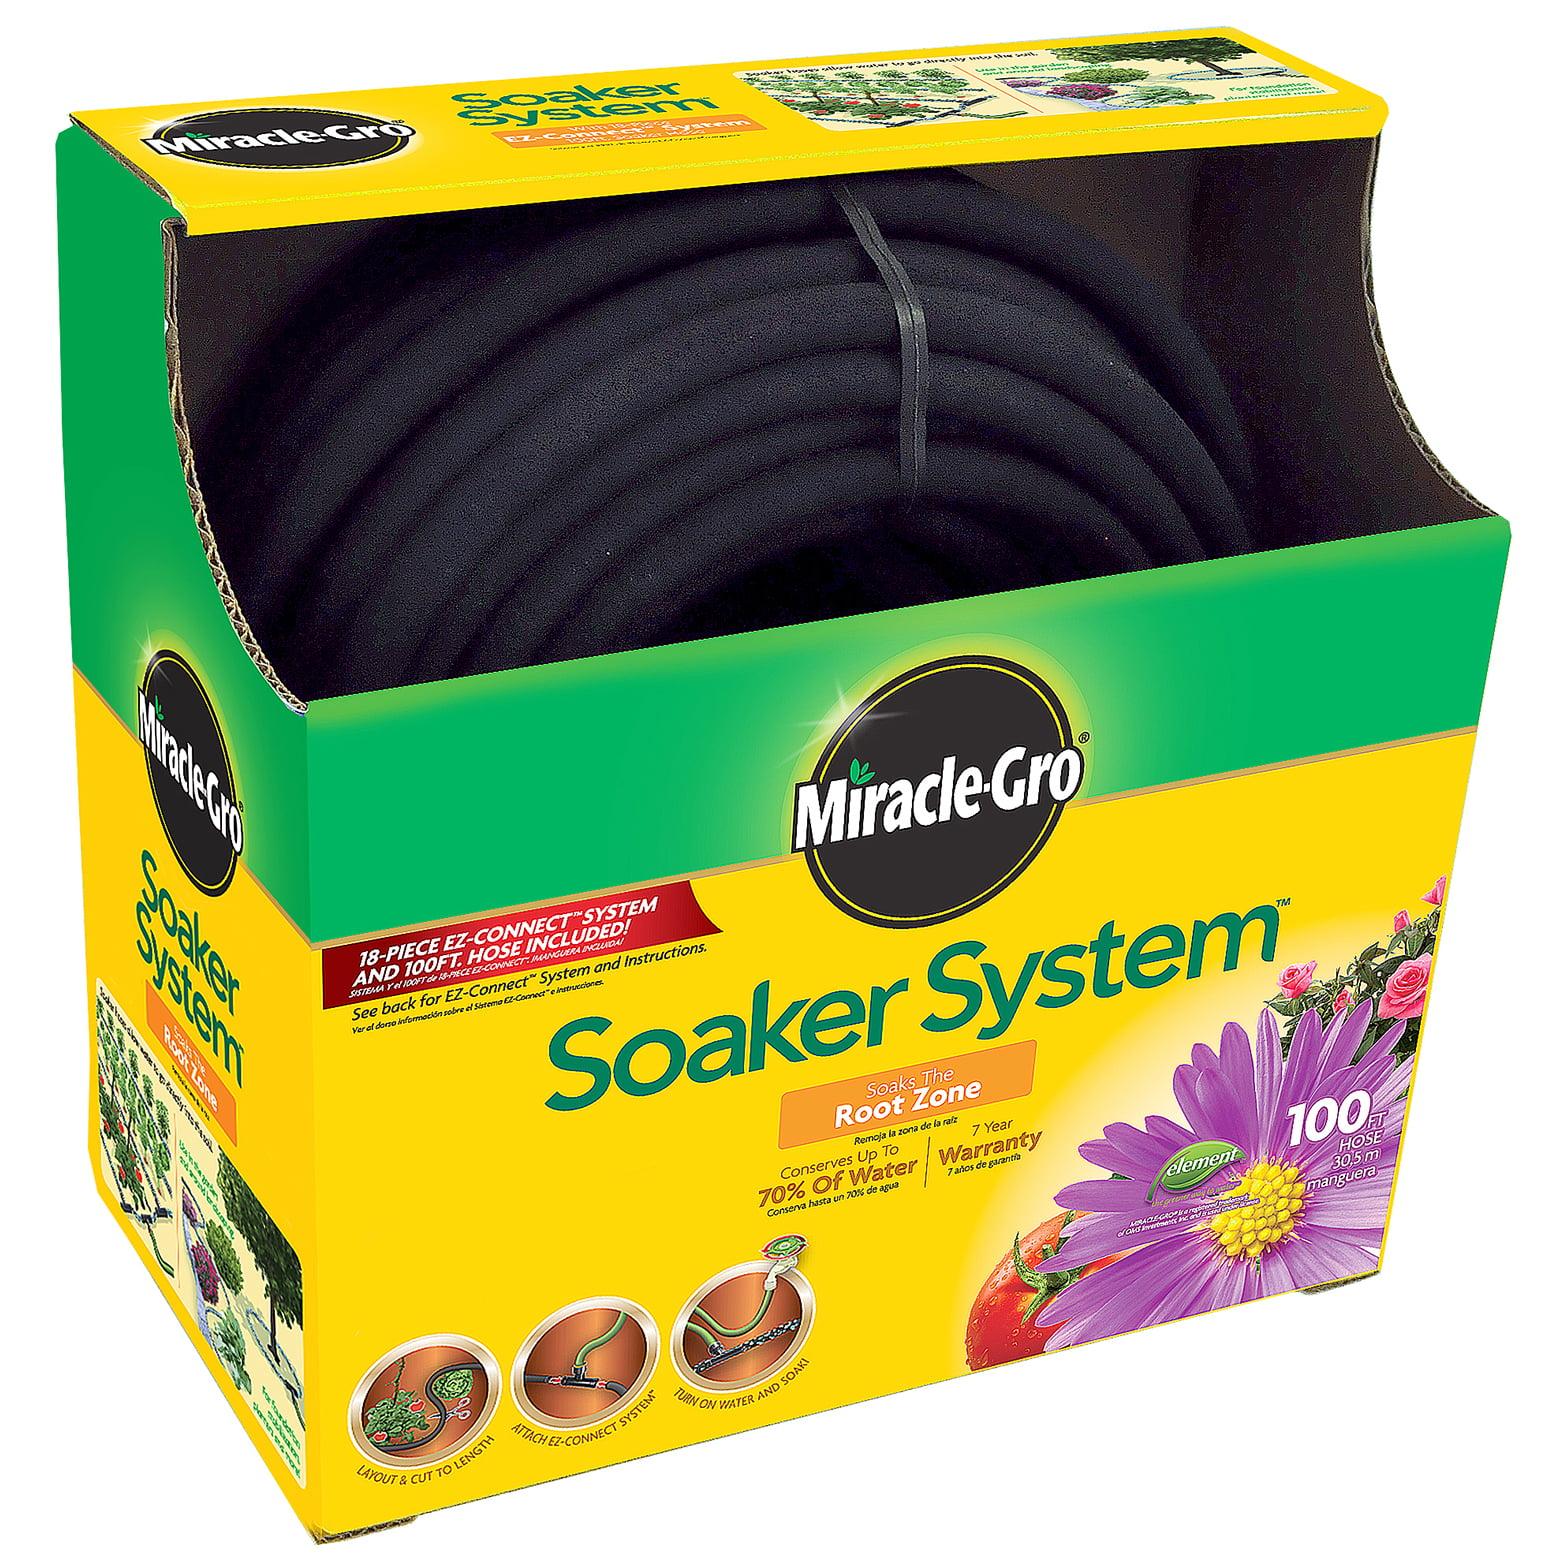 "Miracle Gro MGSPAK38100CC 3/8"" X 100' Miracle-Gro Soaker System"